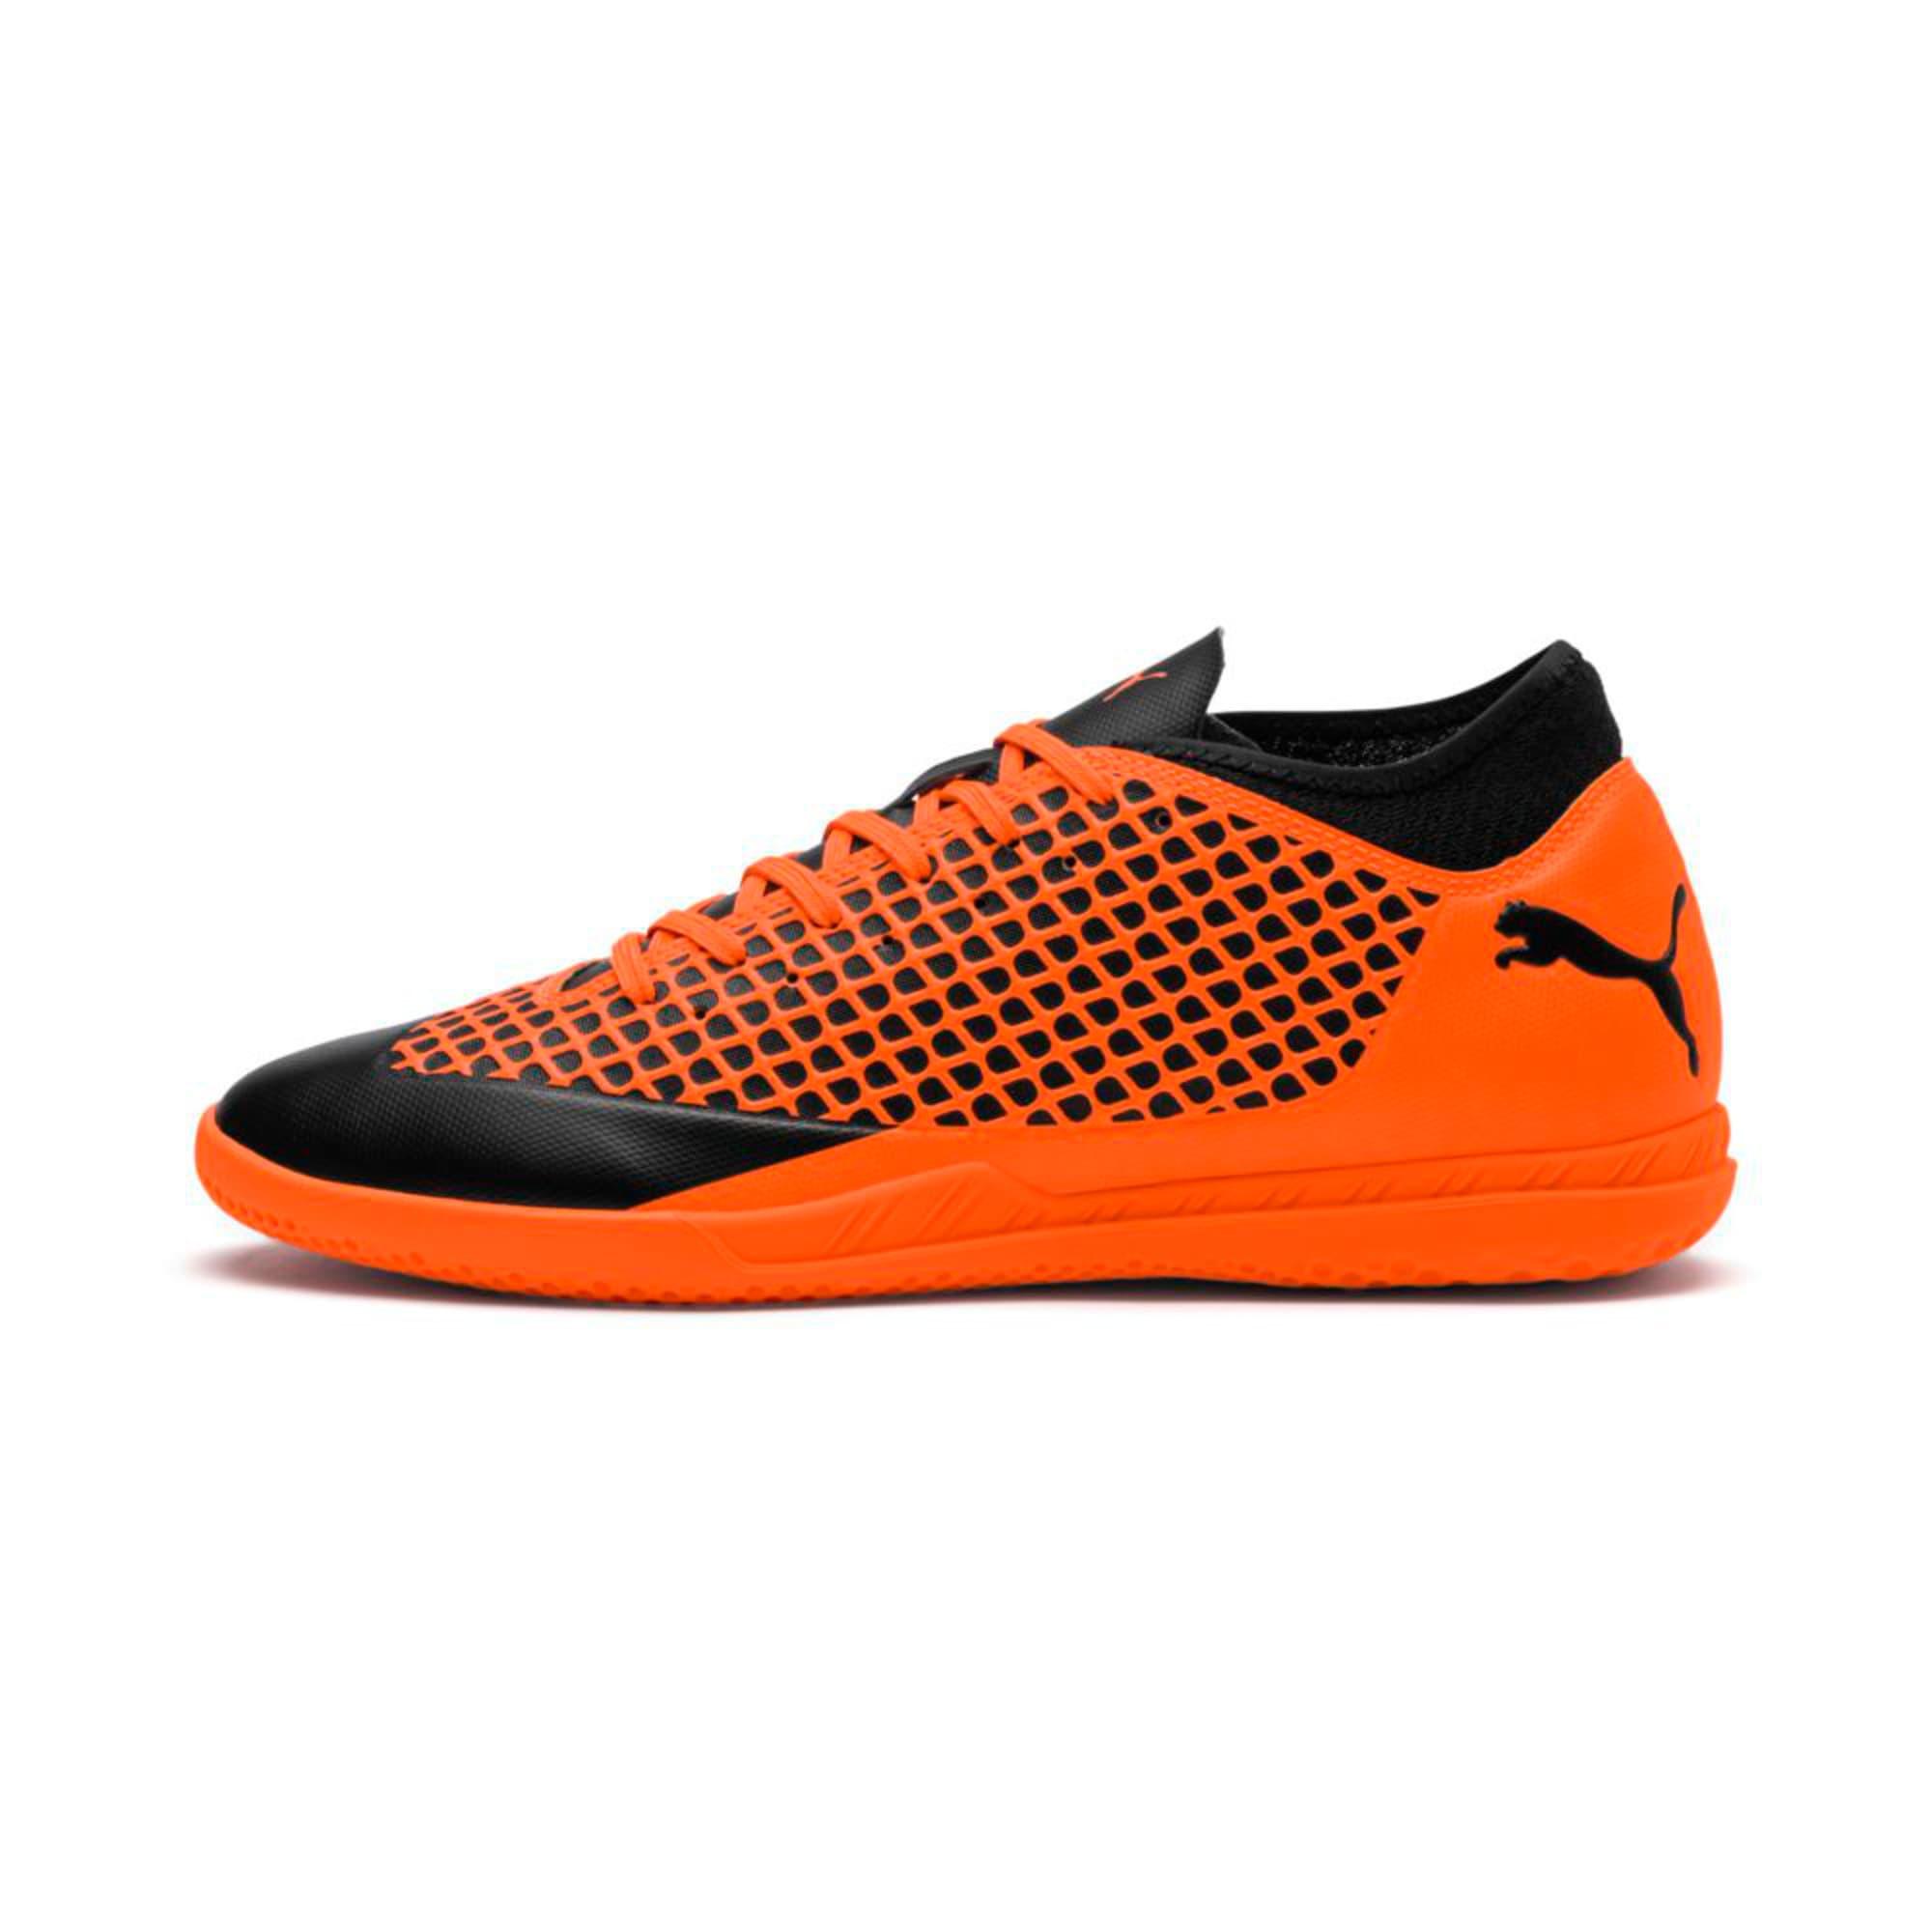 Thumbnail 1 of FUTURE 2.4 IT  Football Shoes, Black-Orange, medium-IND